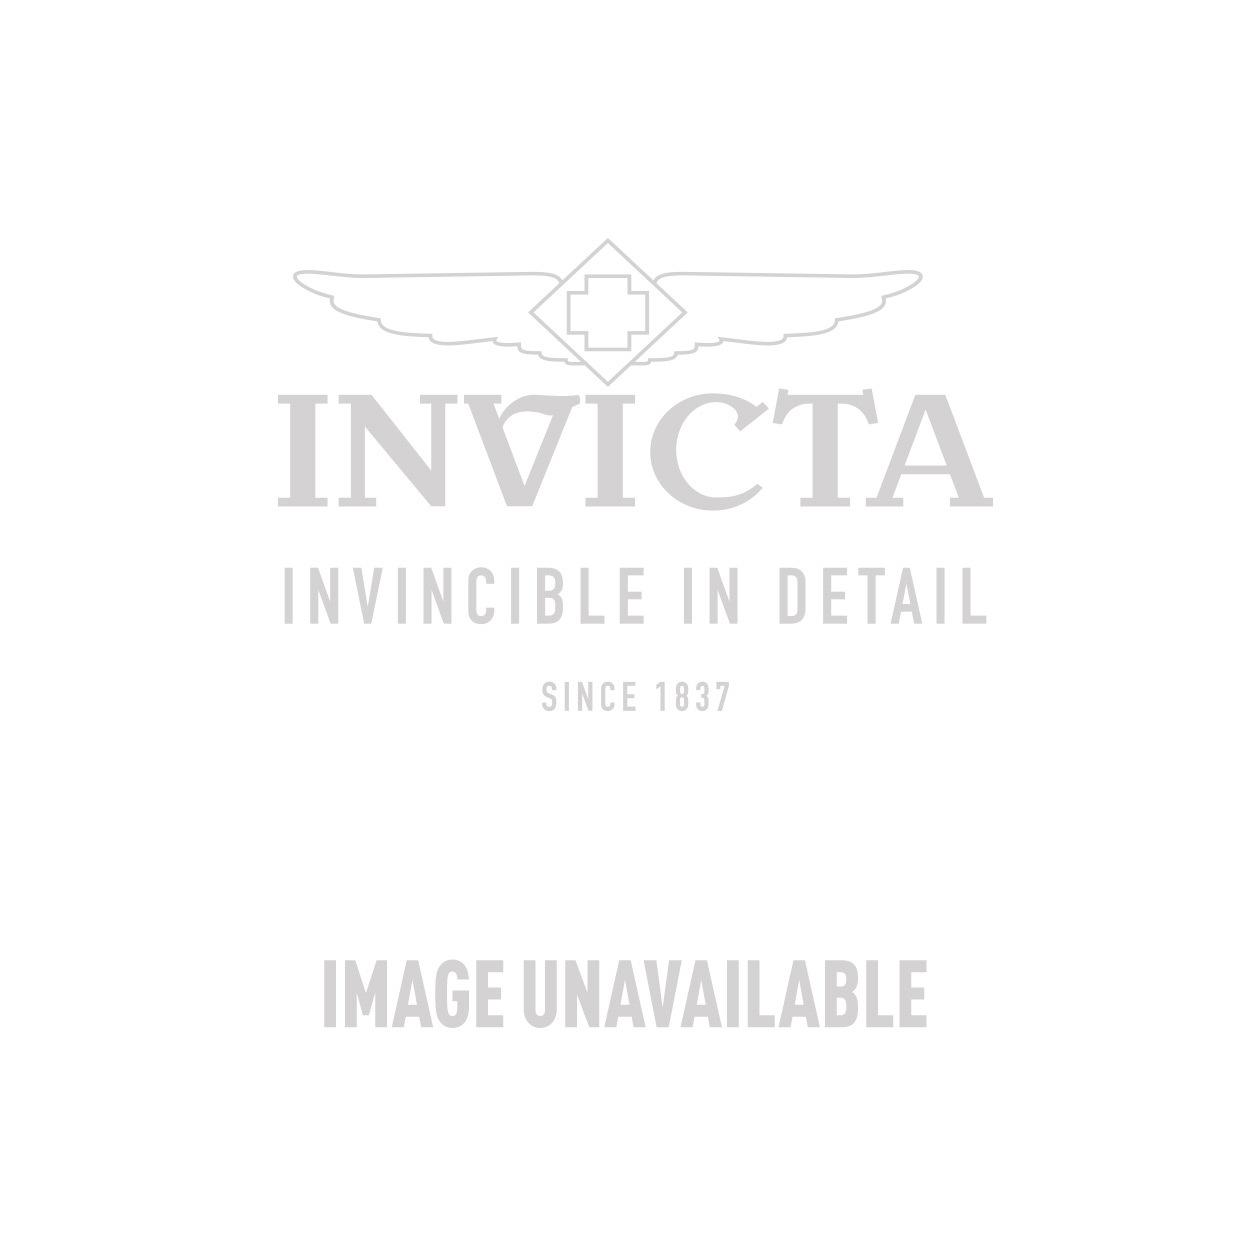 Invicta Corduba Quartz Watch - Gold case with Gold, Black tone Stainless Steel, Polyurethane band - Model 4900